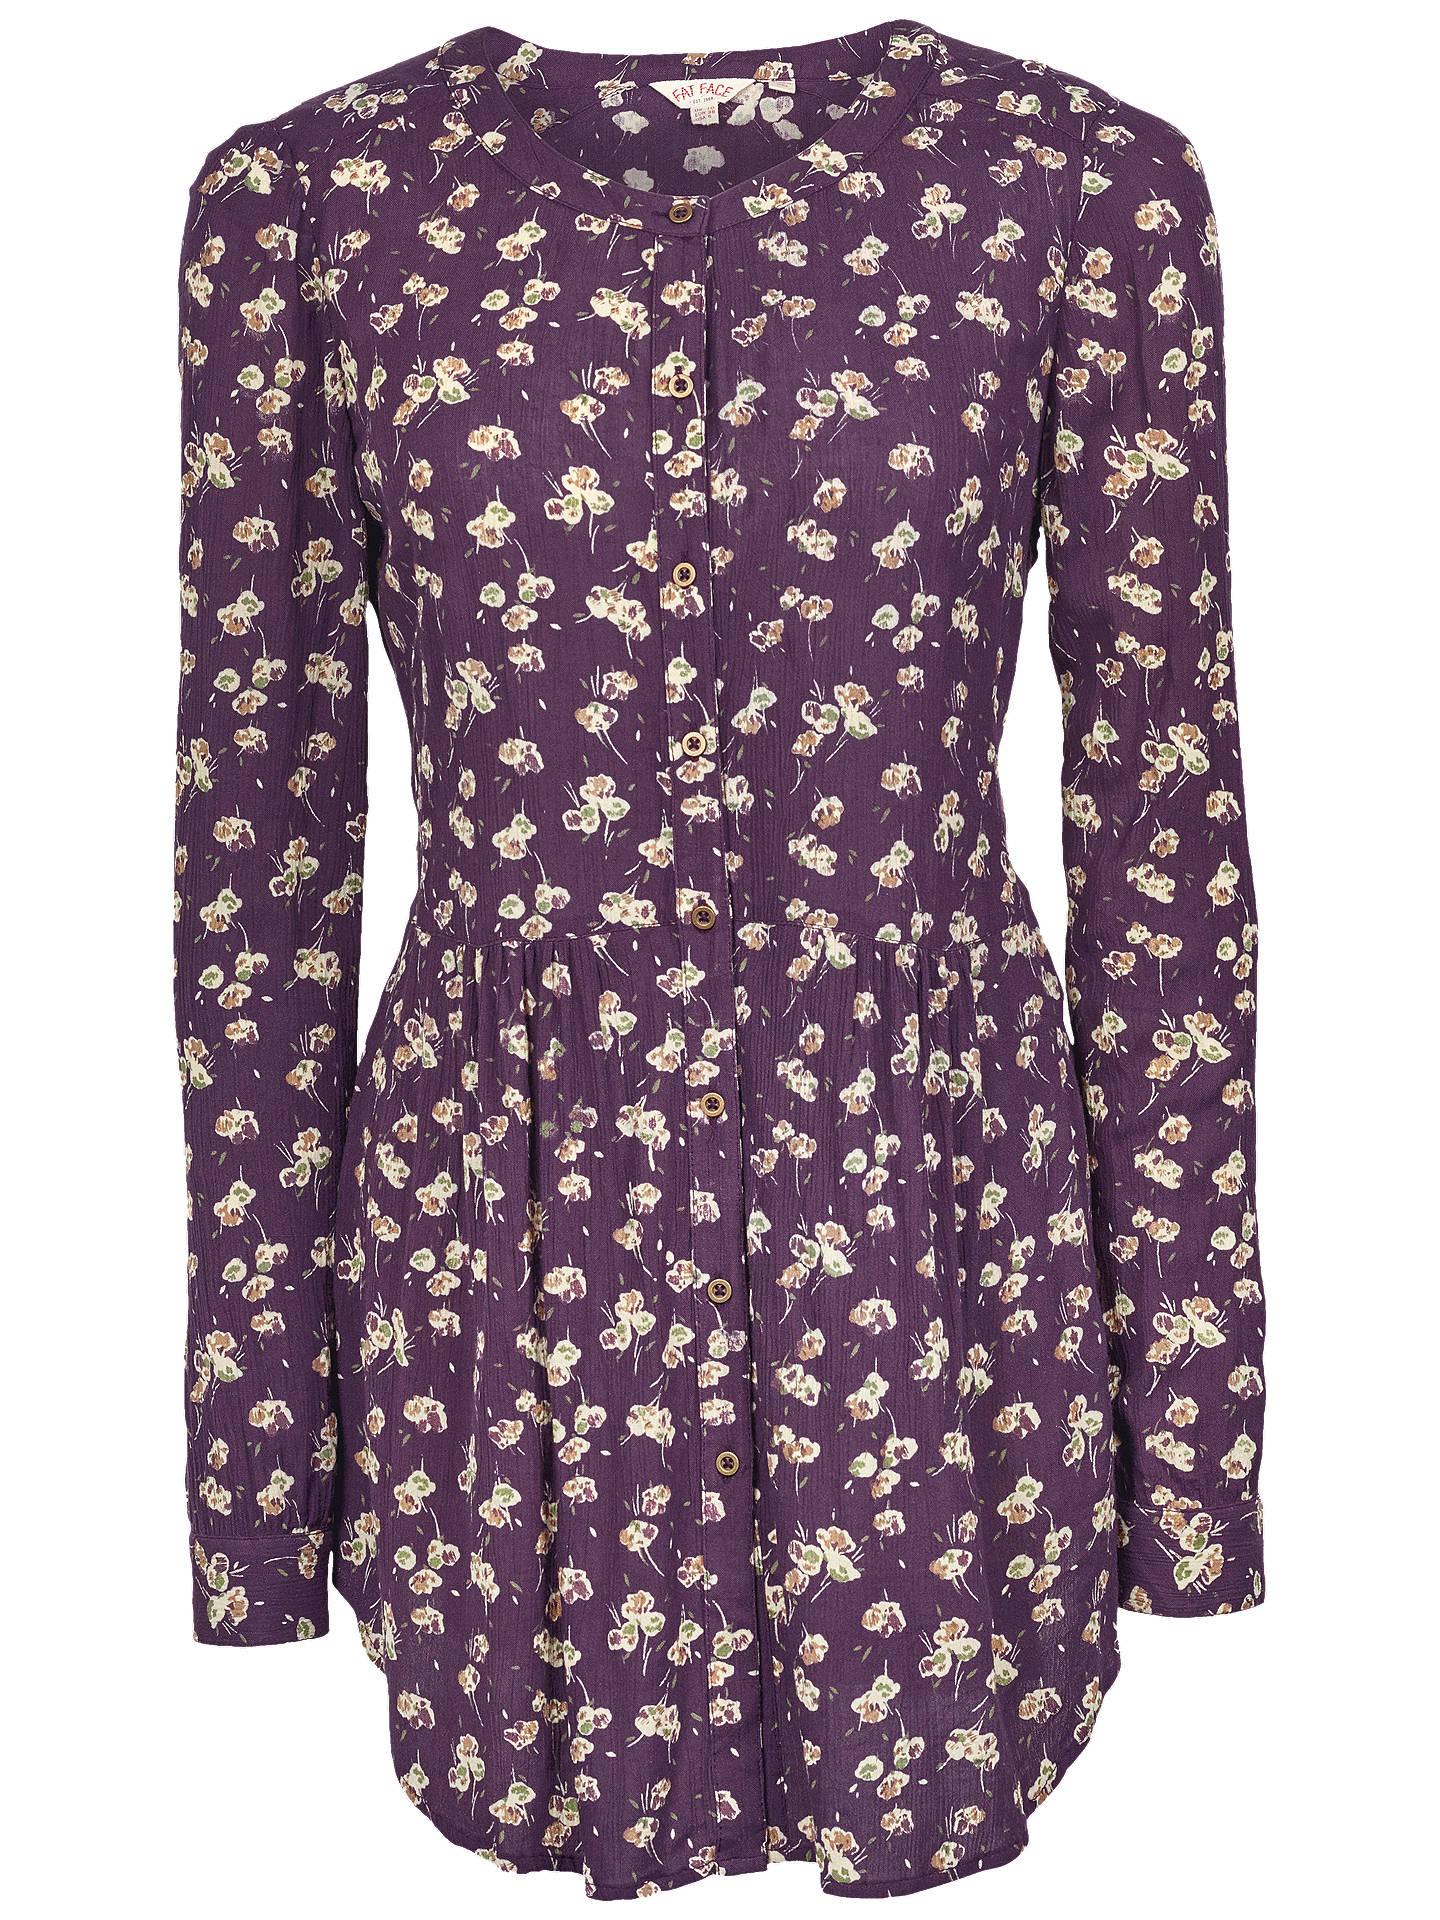 Dresses Generous Fatface Lilac Summer Dress Size 10